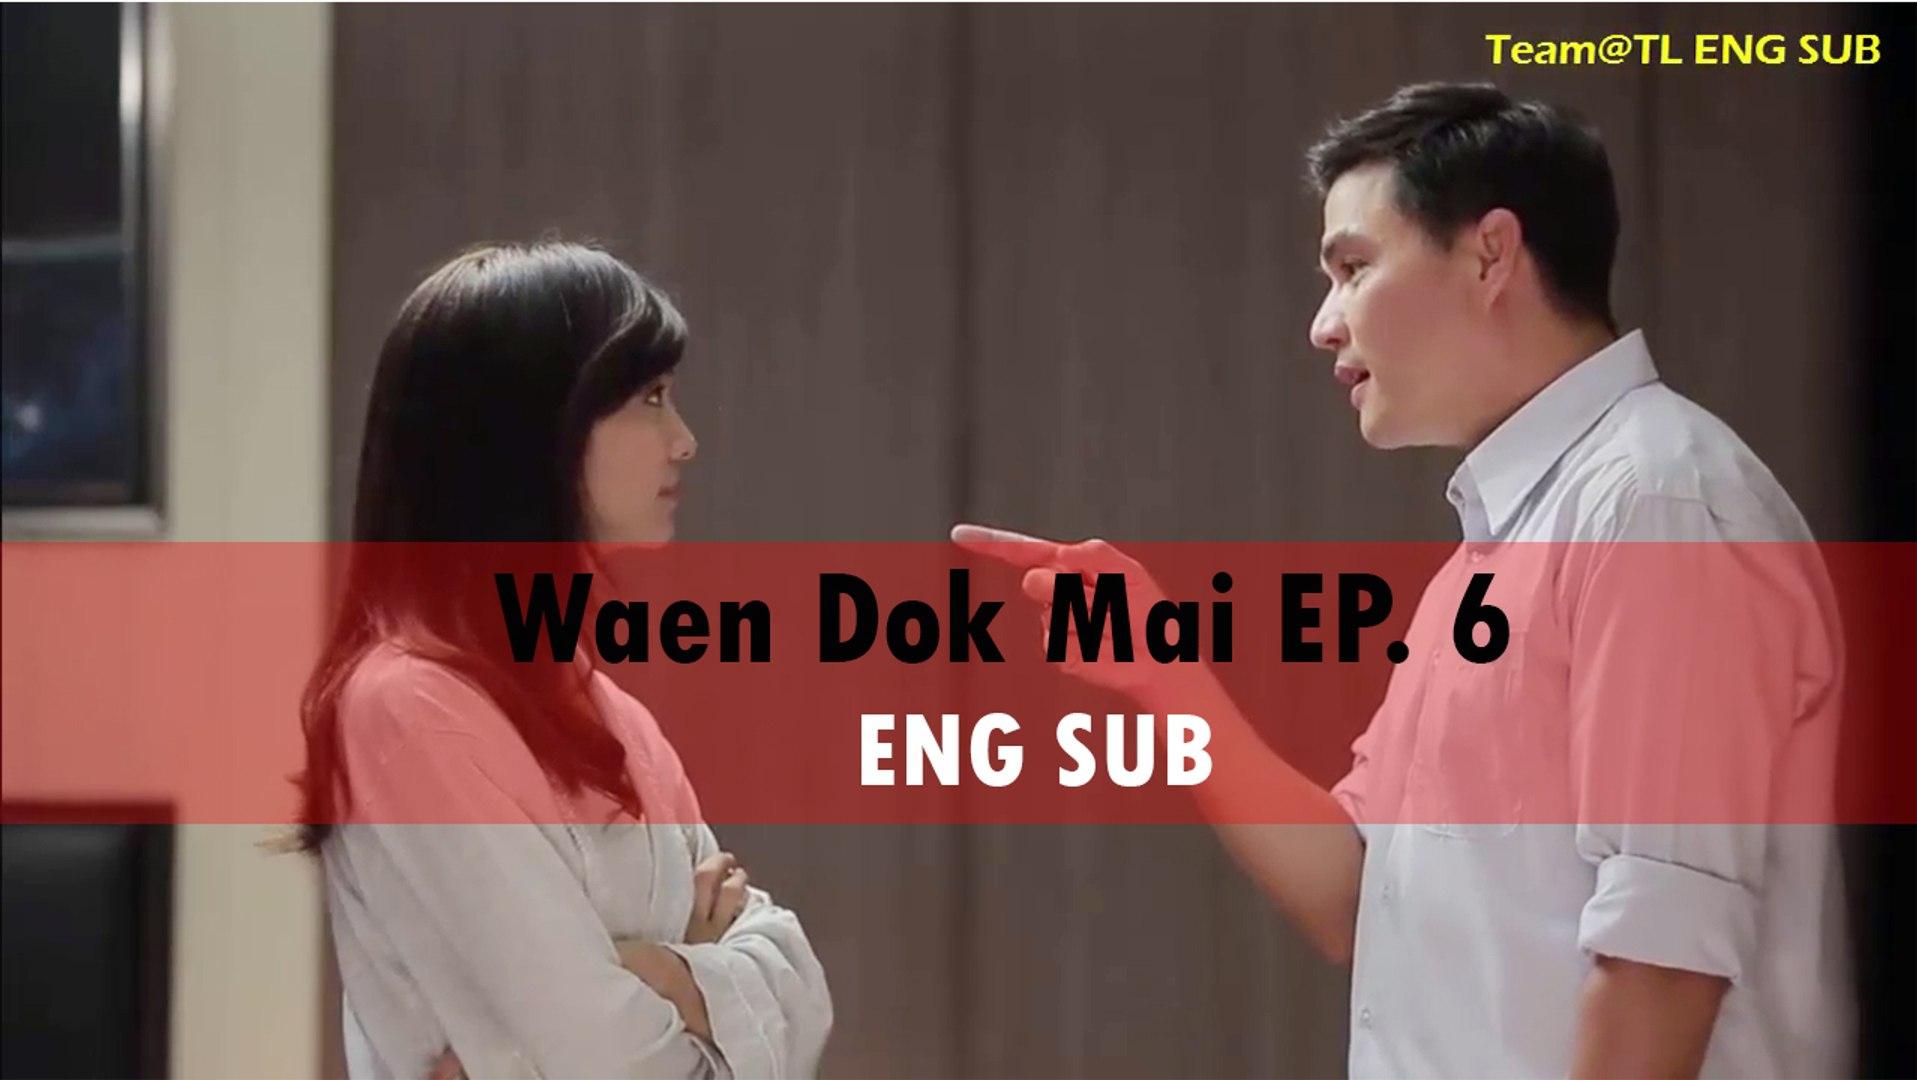 [ENG SUB] Waen Dok Mai EP 6 Eng Sub | Flower Ring Thai Drama EP 6 Eng Sub |  แหวนดอกไม้ EP 06 | Will You Marry Me?